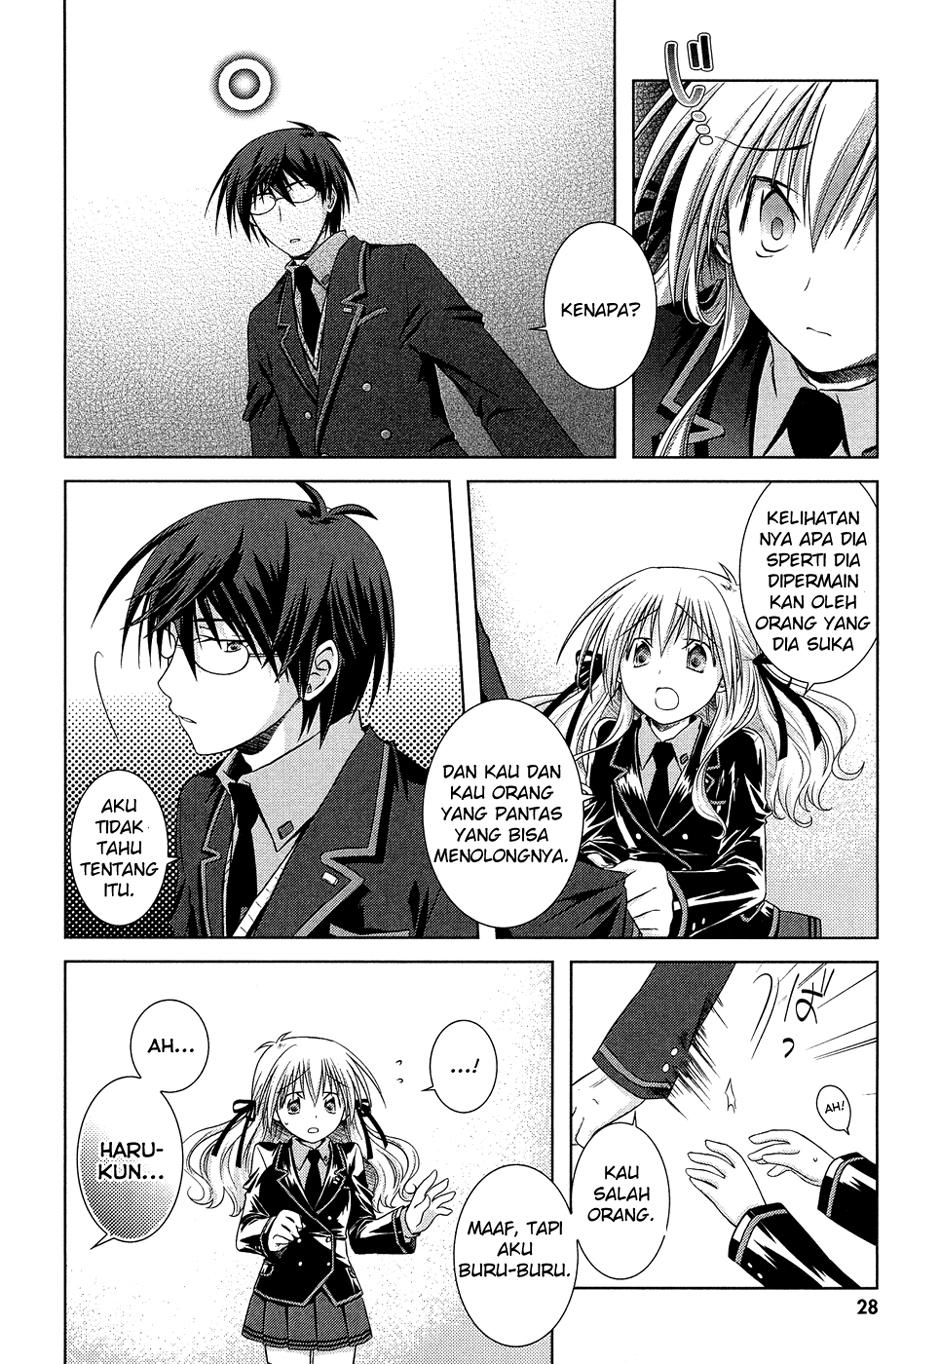 Komik iris zero 011 12 Indonesia iris zero 011 Terbaru 1 Baca Manga Komik Indonesia 